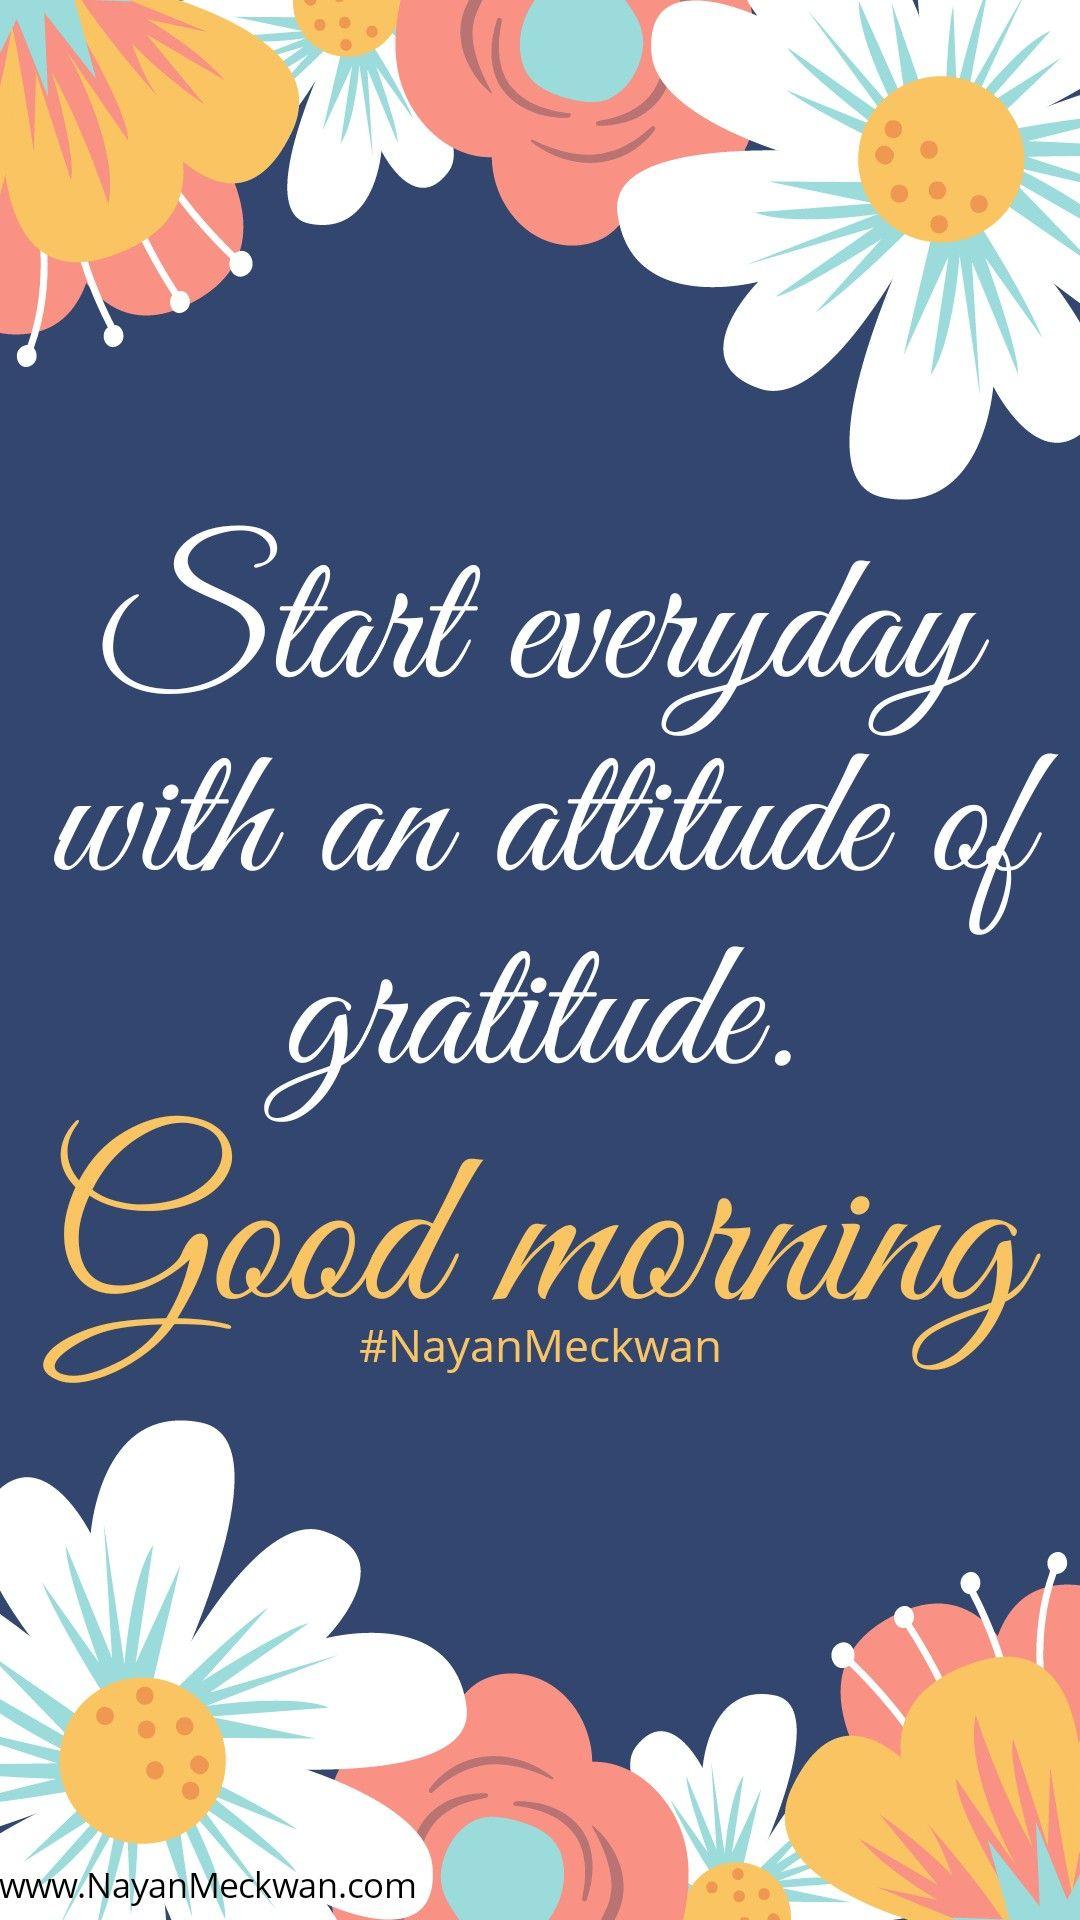 Good Morning Image Whatsapp Story Status 2018 Whatsapp Status Goodmorning Morning Quotes English Good Morning Quotes Morning Quotes Good Morning Images